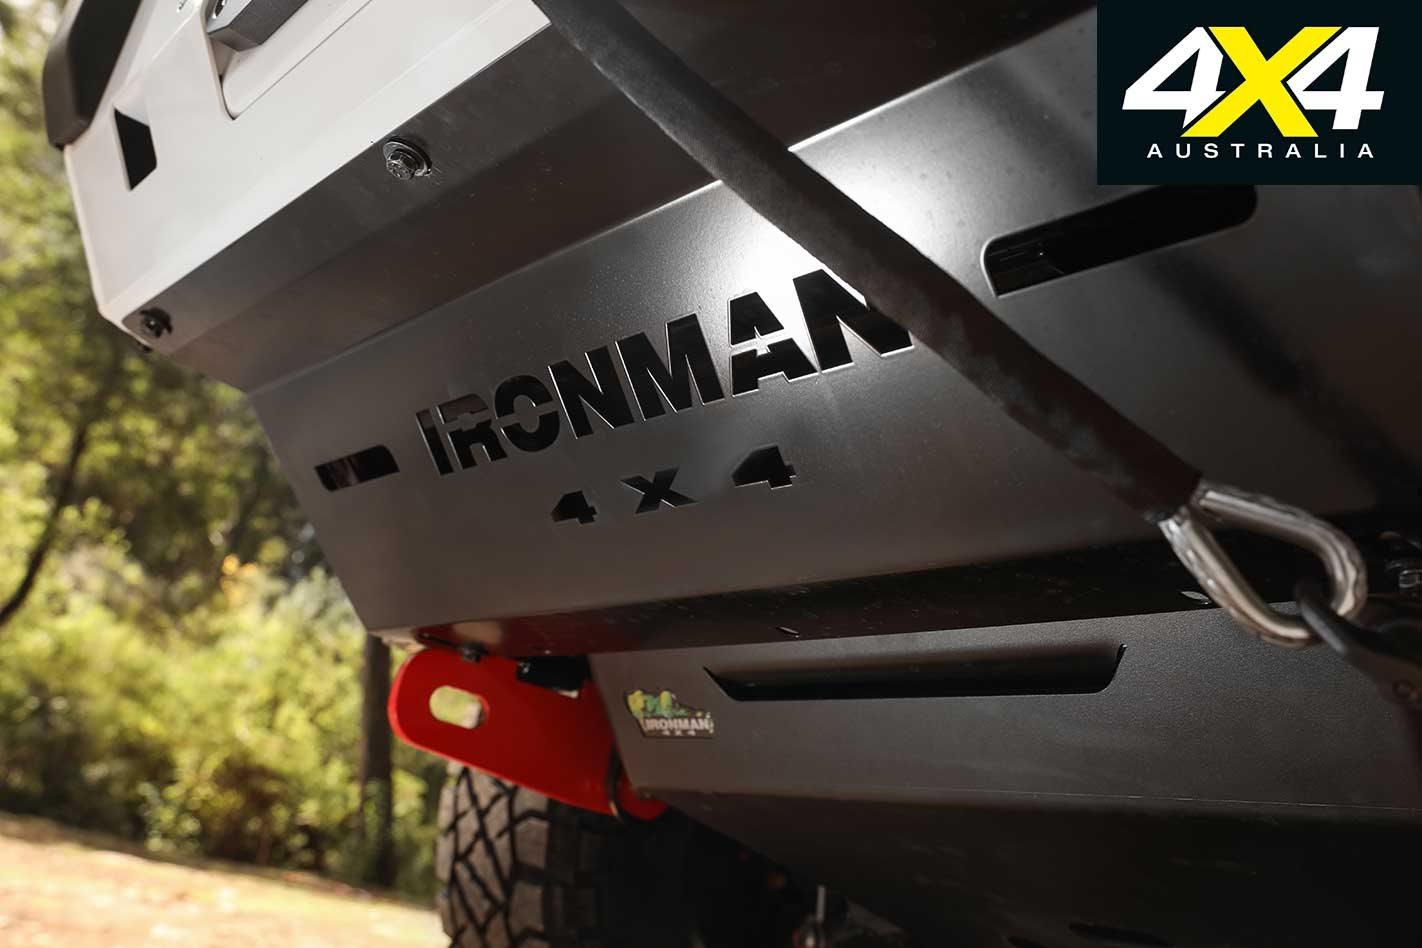 Ironman 4x4 popular ute accessories review   4x4 Australia